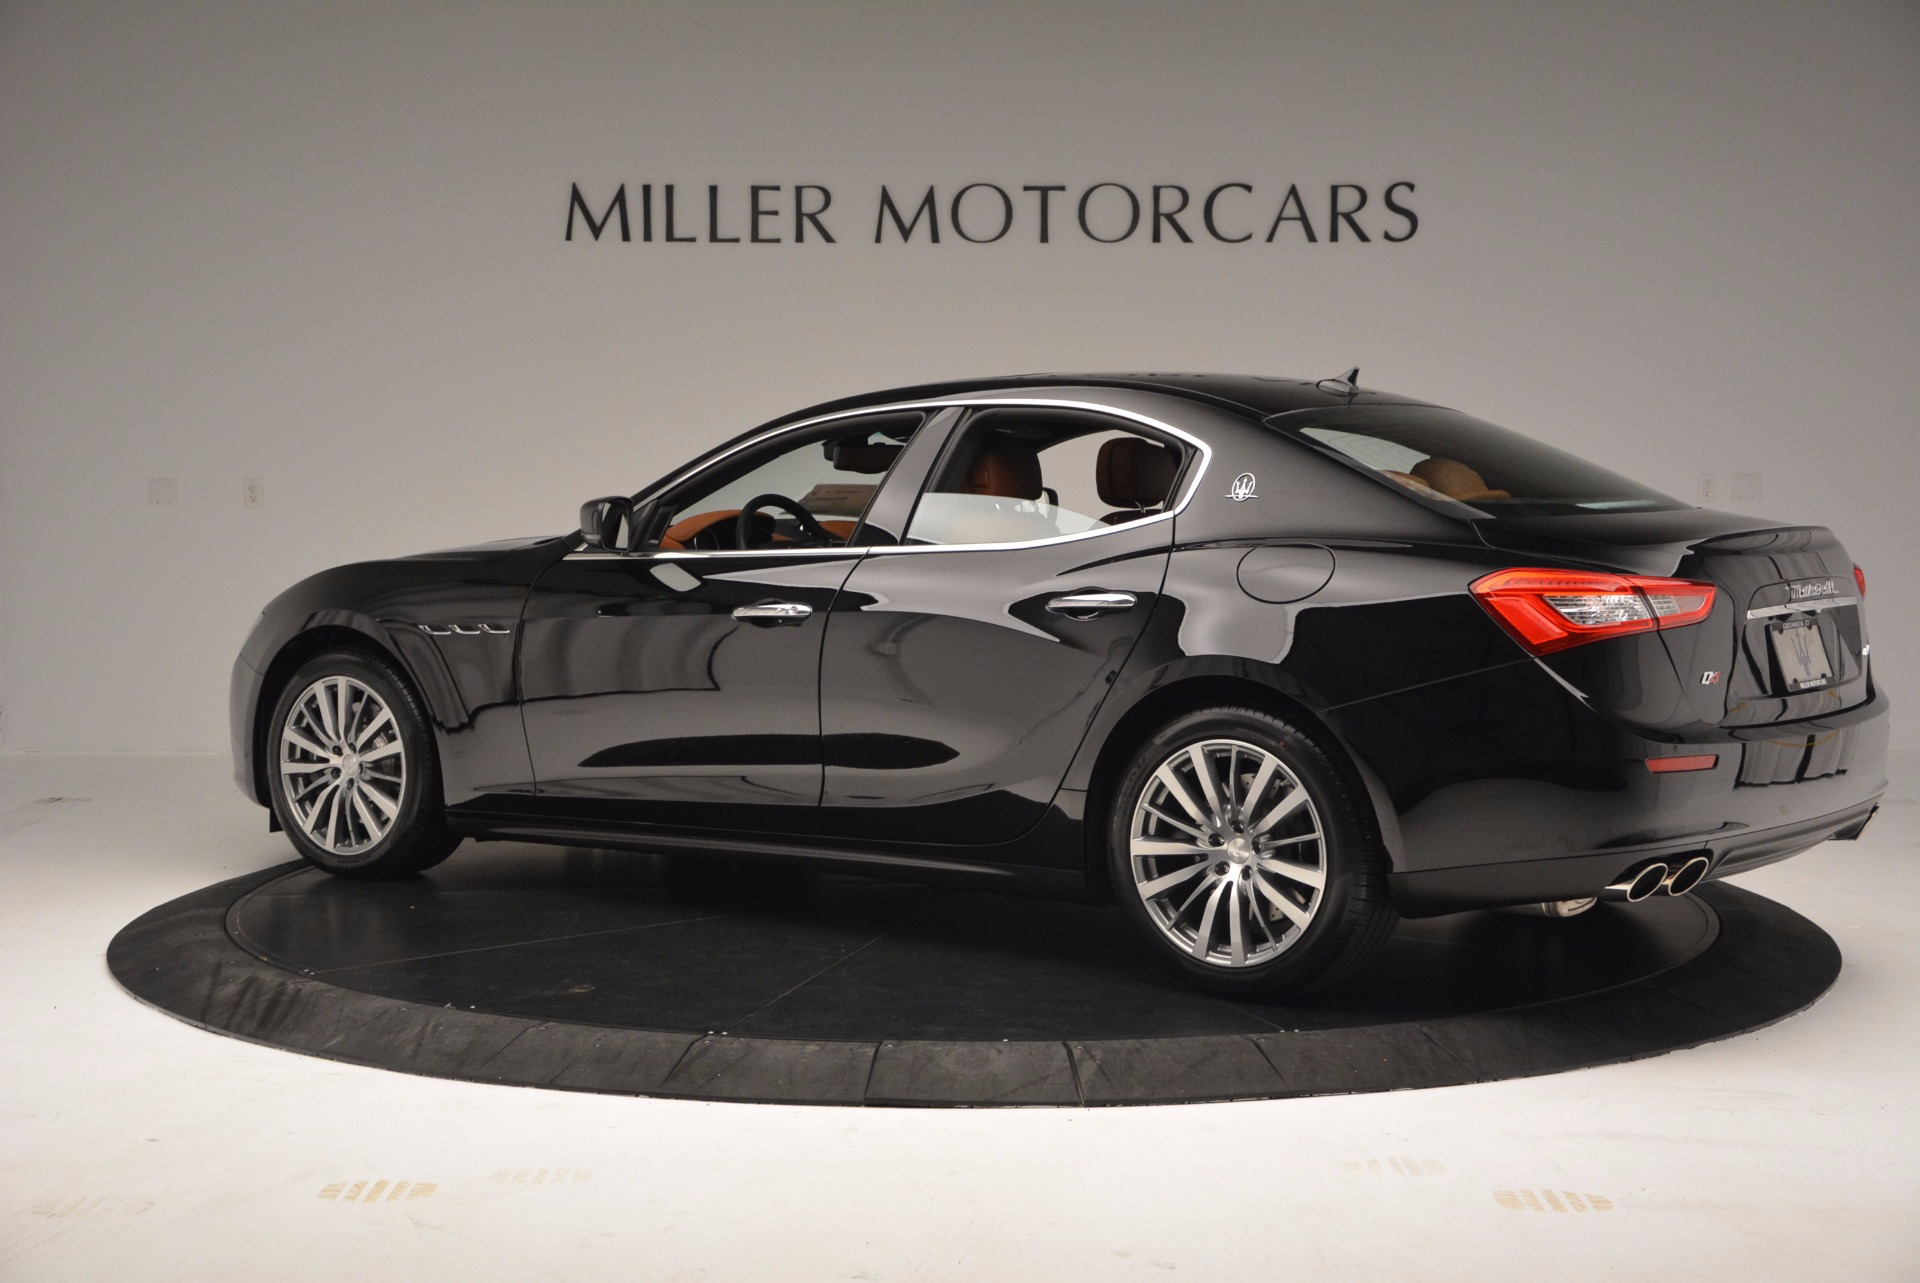 New 2017 Maserati Ghibli S Q4 EX-LOANER For Sale In Greenwich, CT. Alfa Romeo of Greenwich, M1859 1115_p4